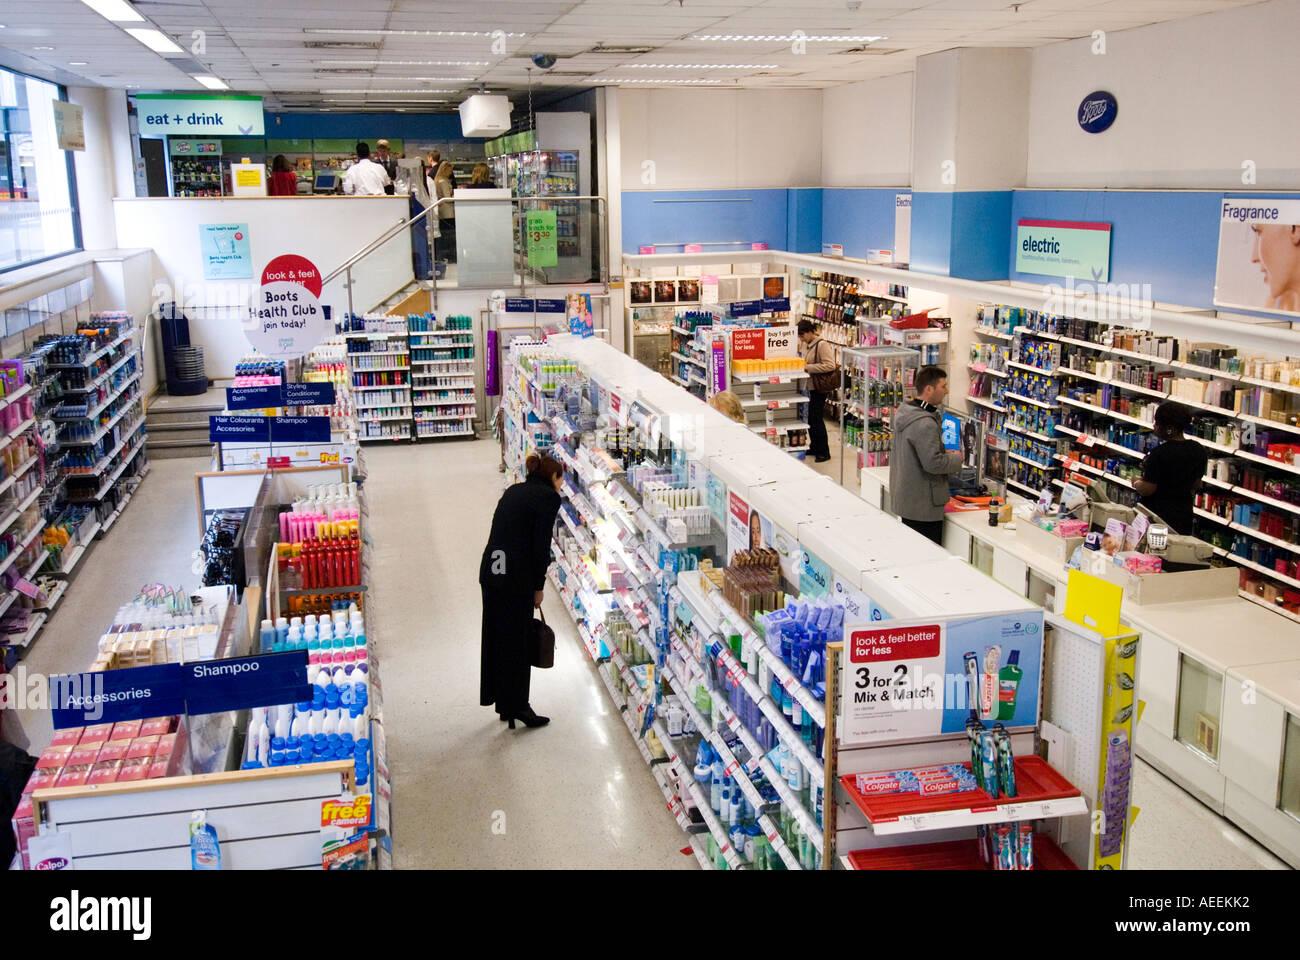 boots pharmacy london england uk stock photo 7806065 alamy. Black Bedroom Furniture Sets. Home Design Ideas